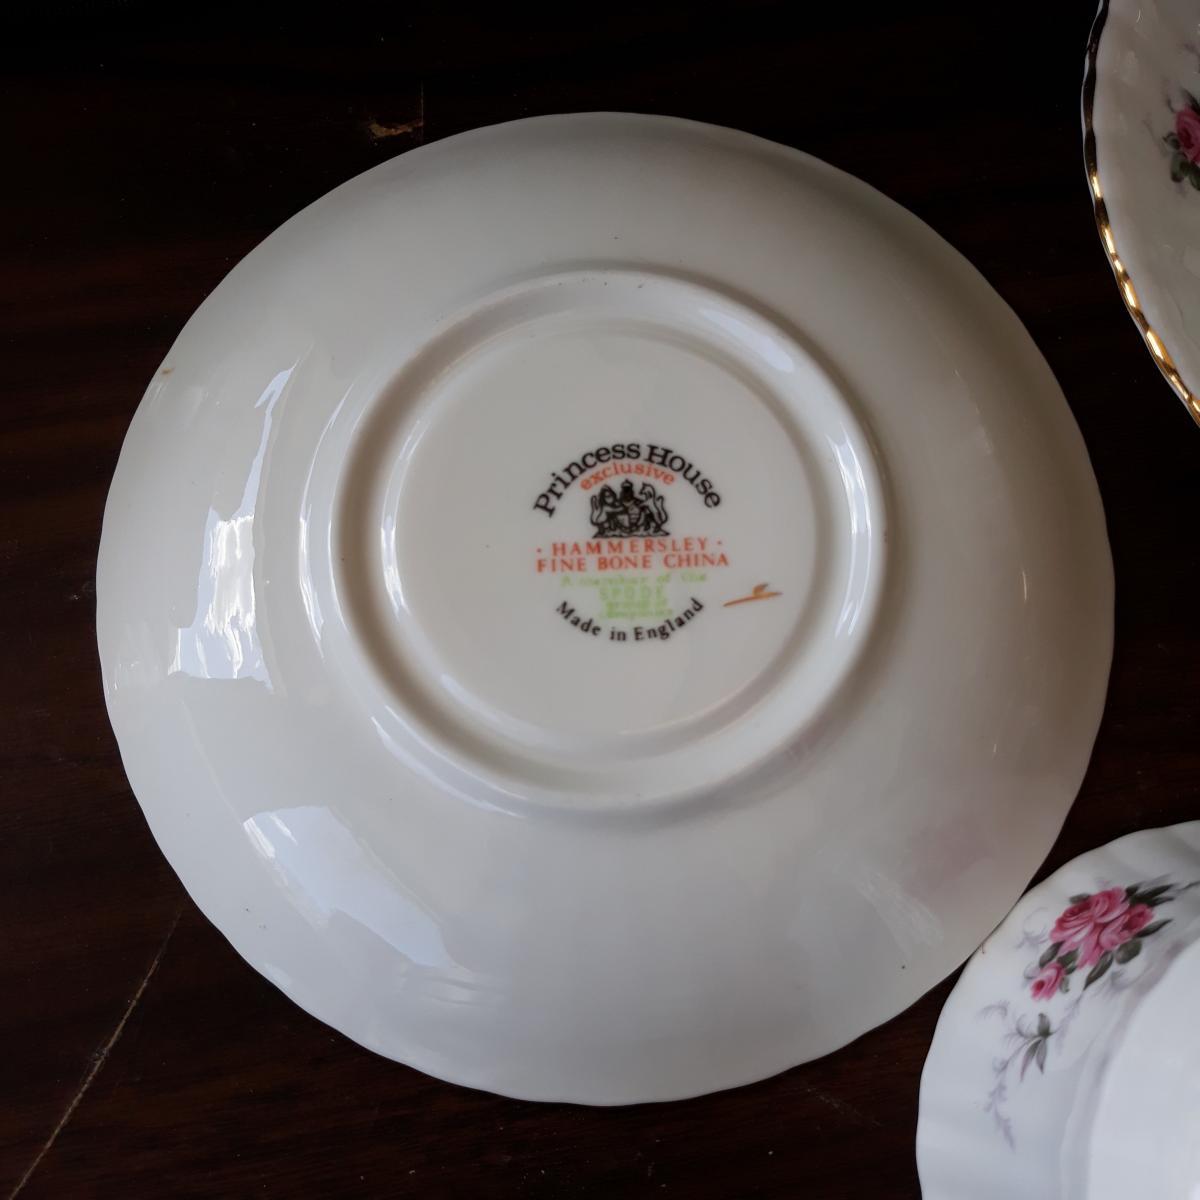 Photo 3 of Collectible china